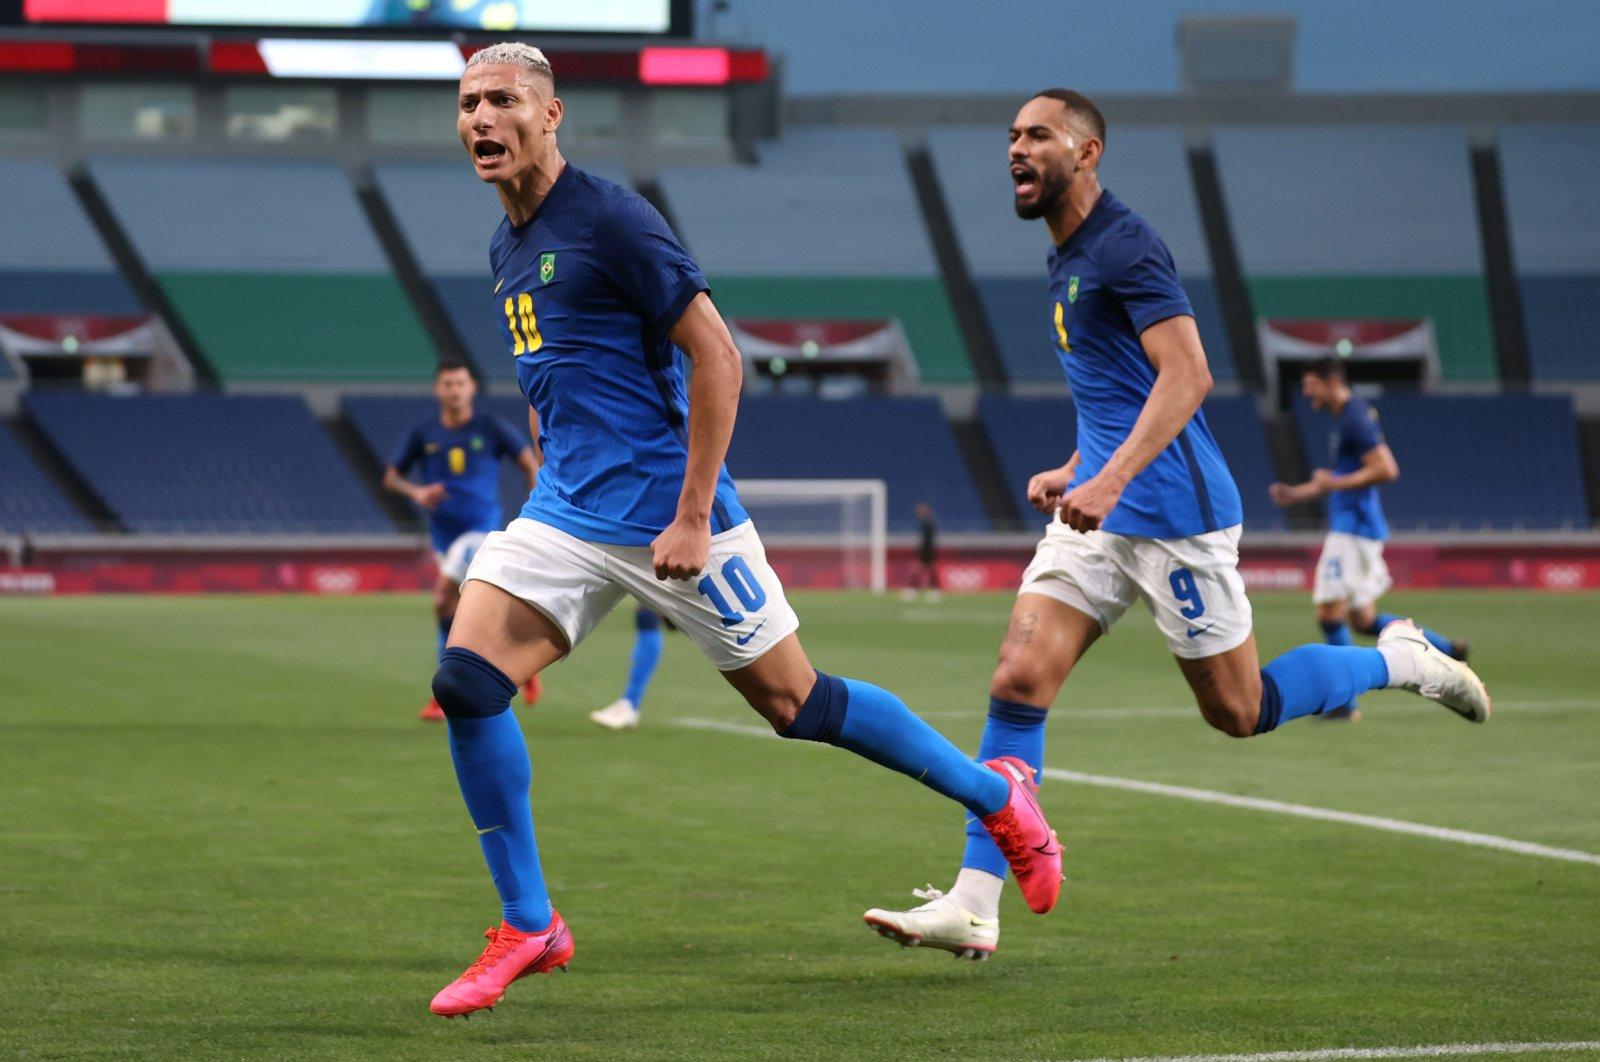 Brazil's Richarlison celebrates scoring his team's second goal against Saudi Arabia during the Tokyo 2020 Olympics men's football tournament at Saitama Stadium, Saitama, Japan, July 28, 2021.